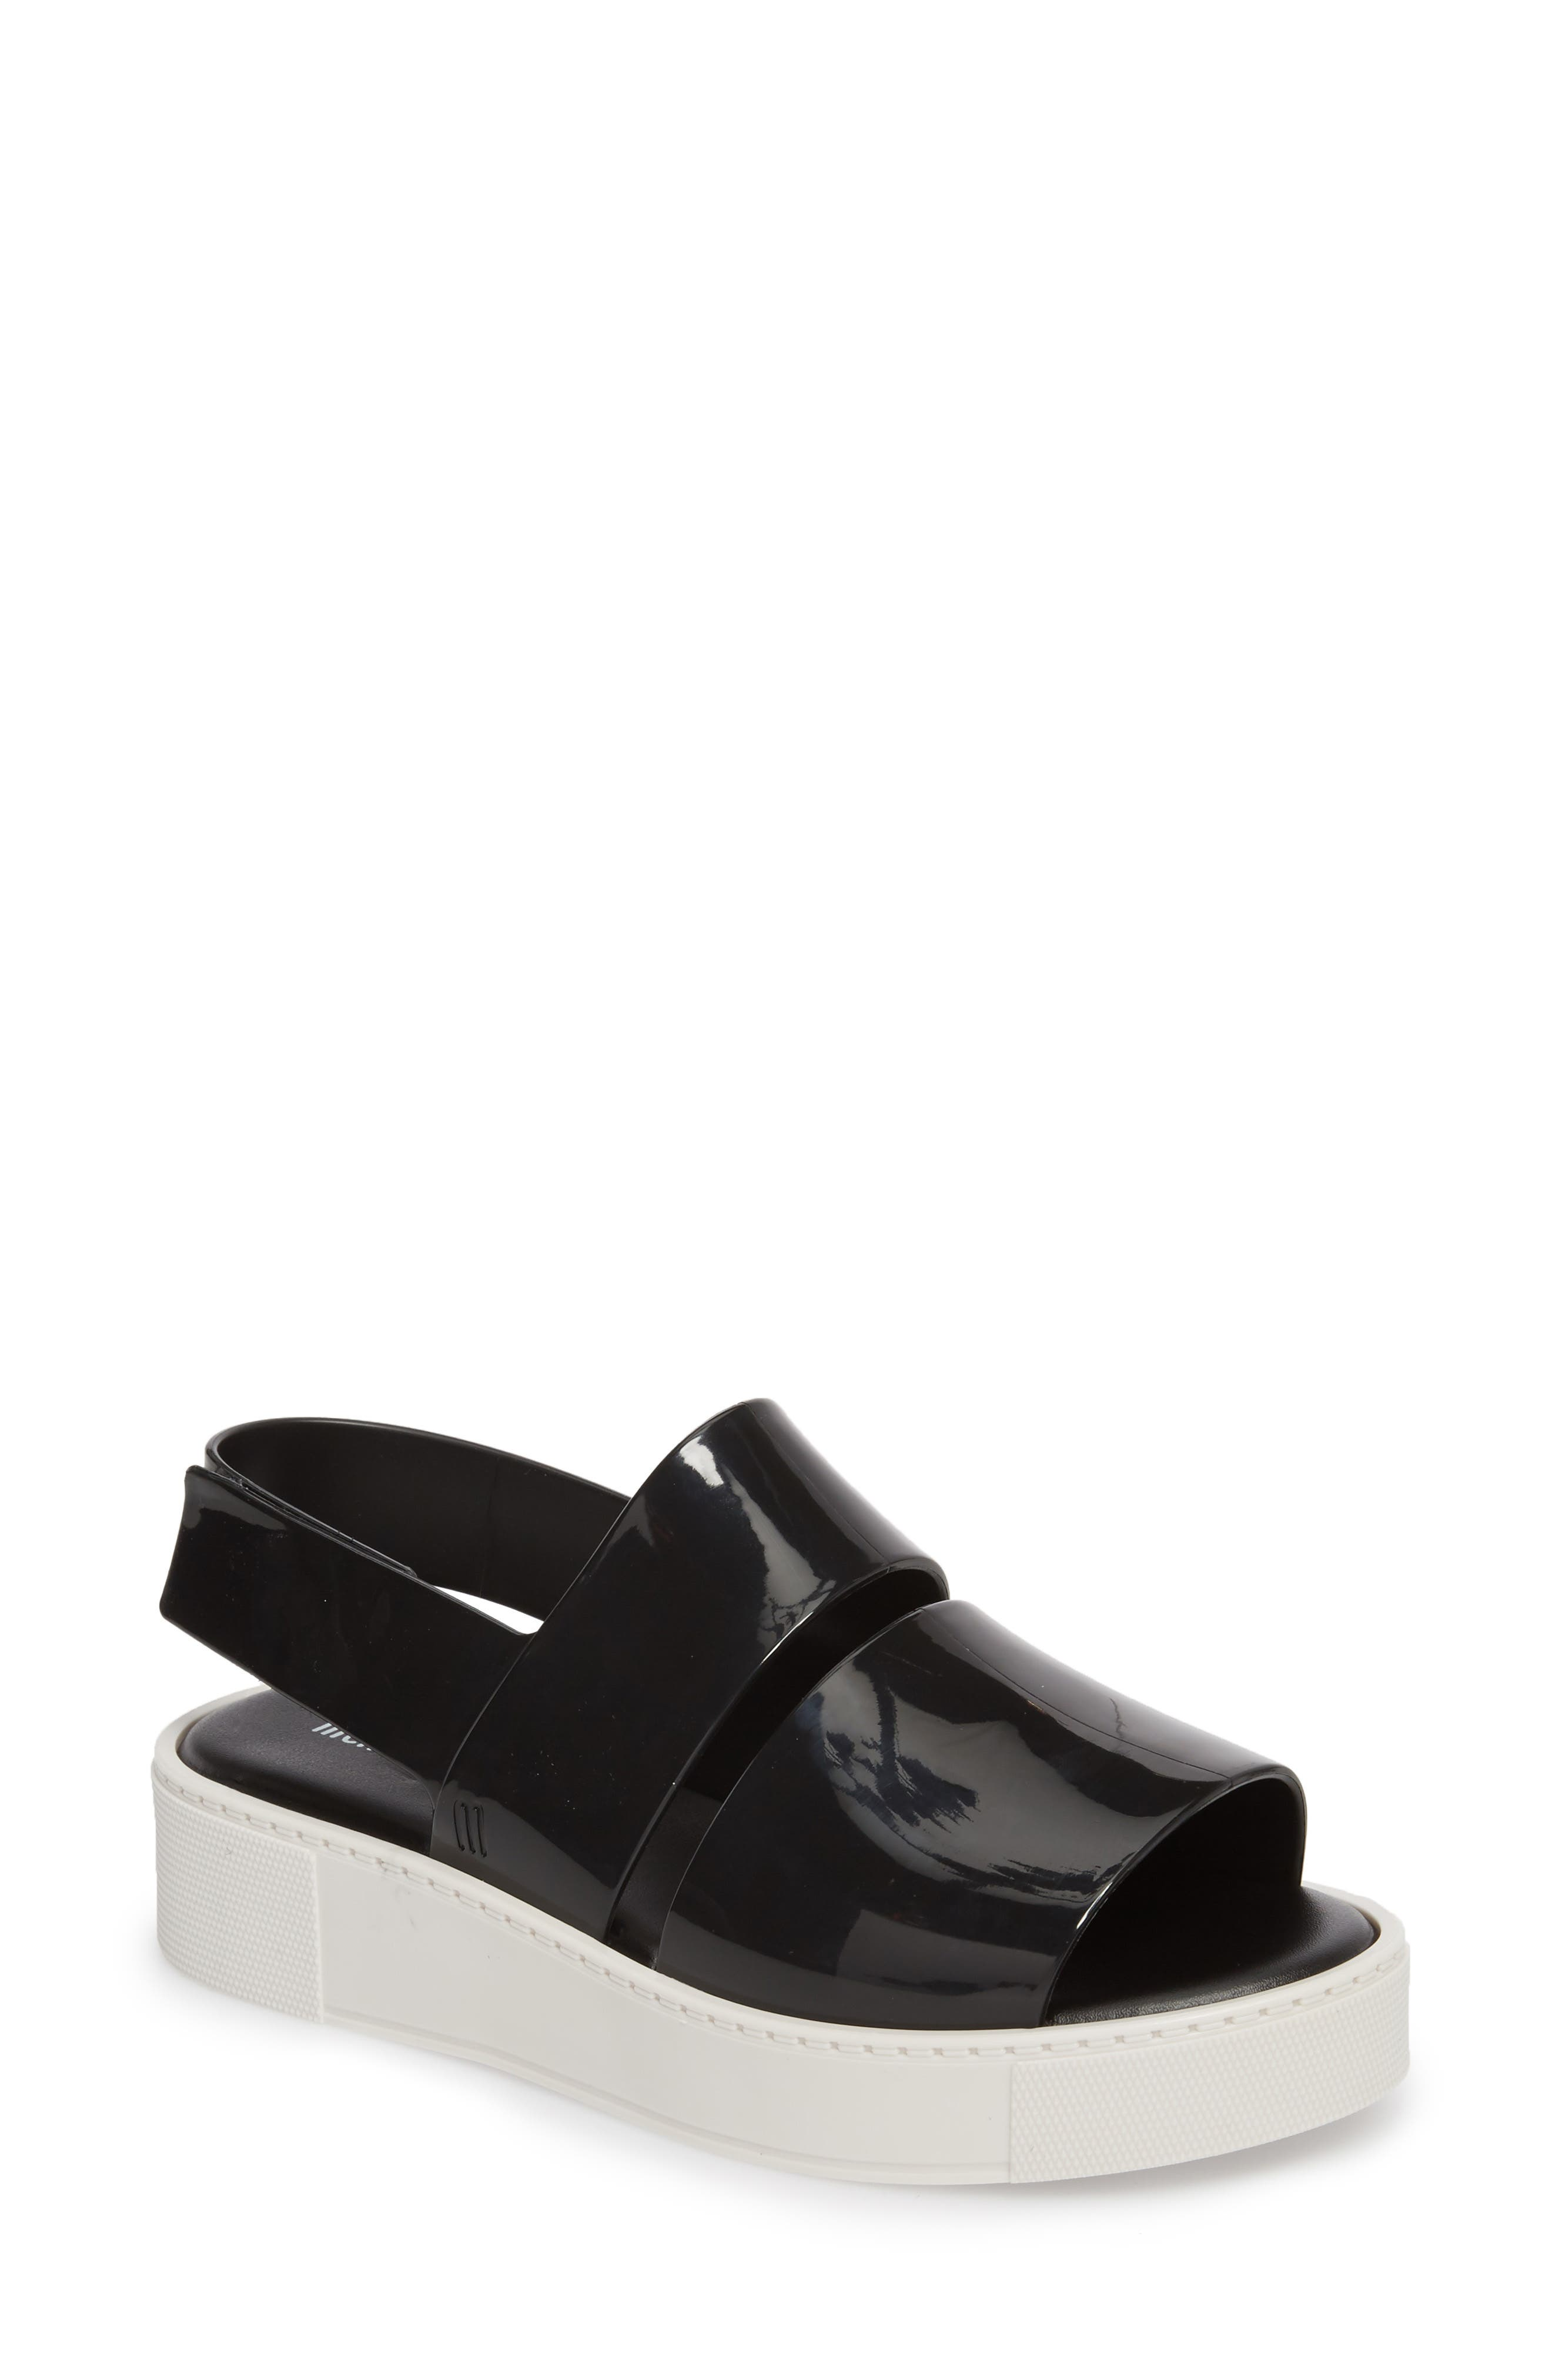 Soho Platform Sandal,                             Main thumbnail 1, color,                             001